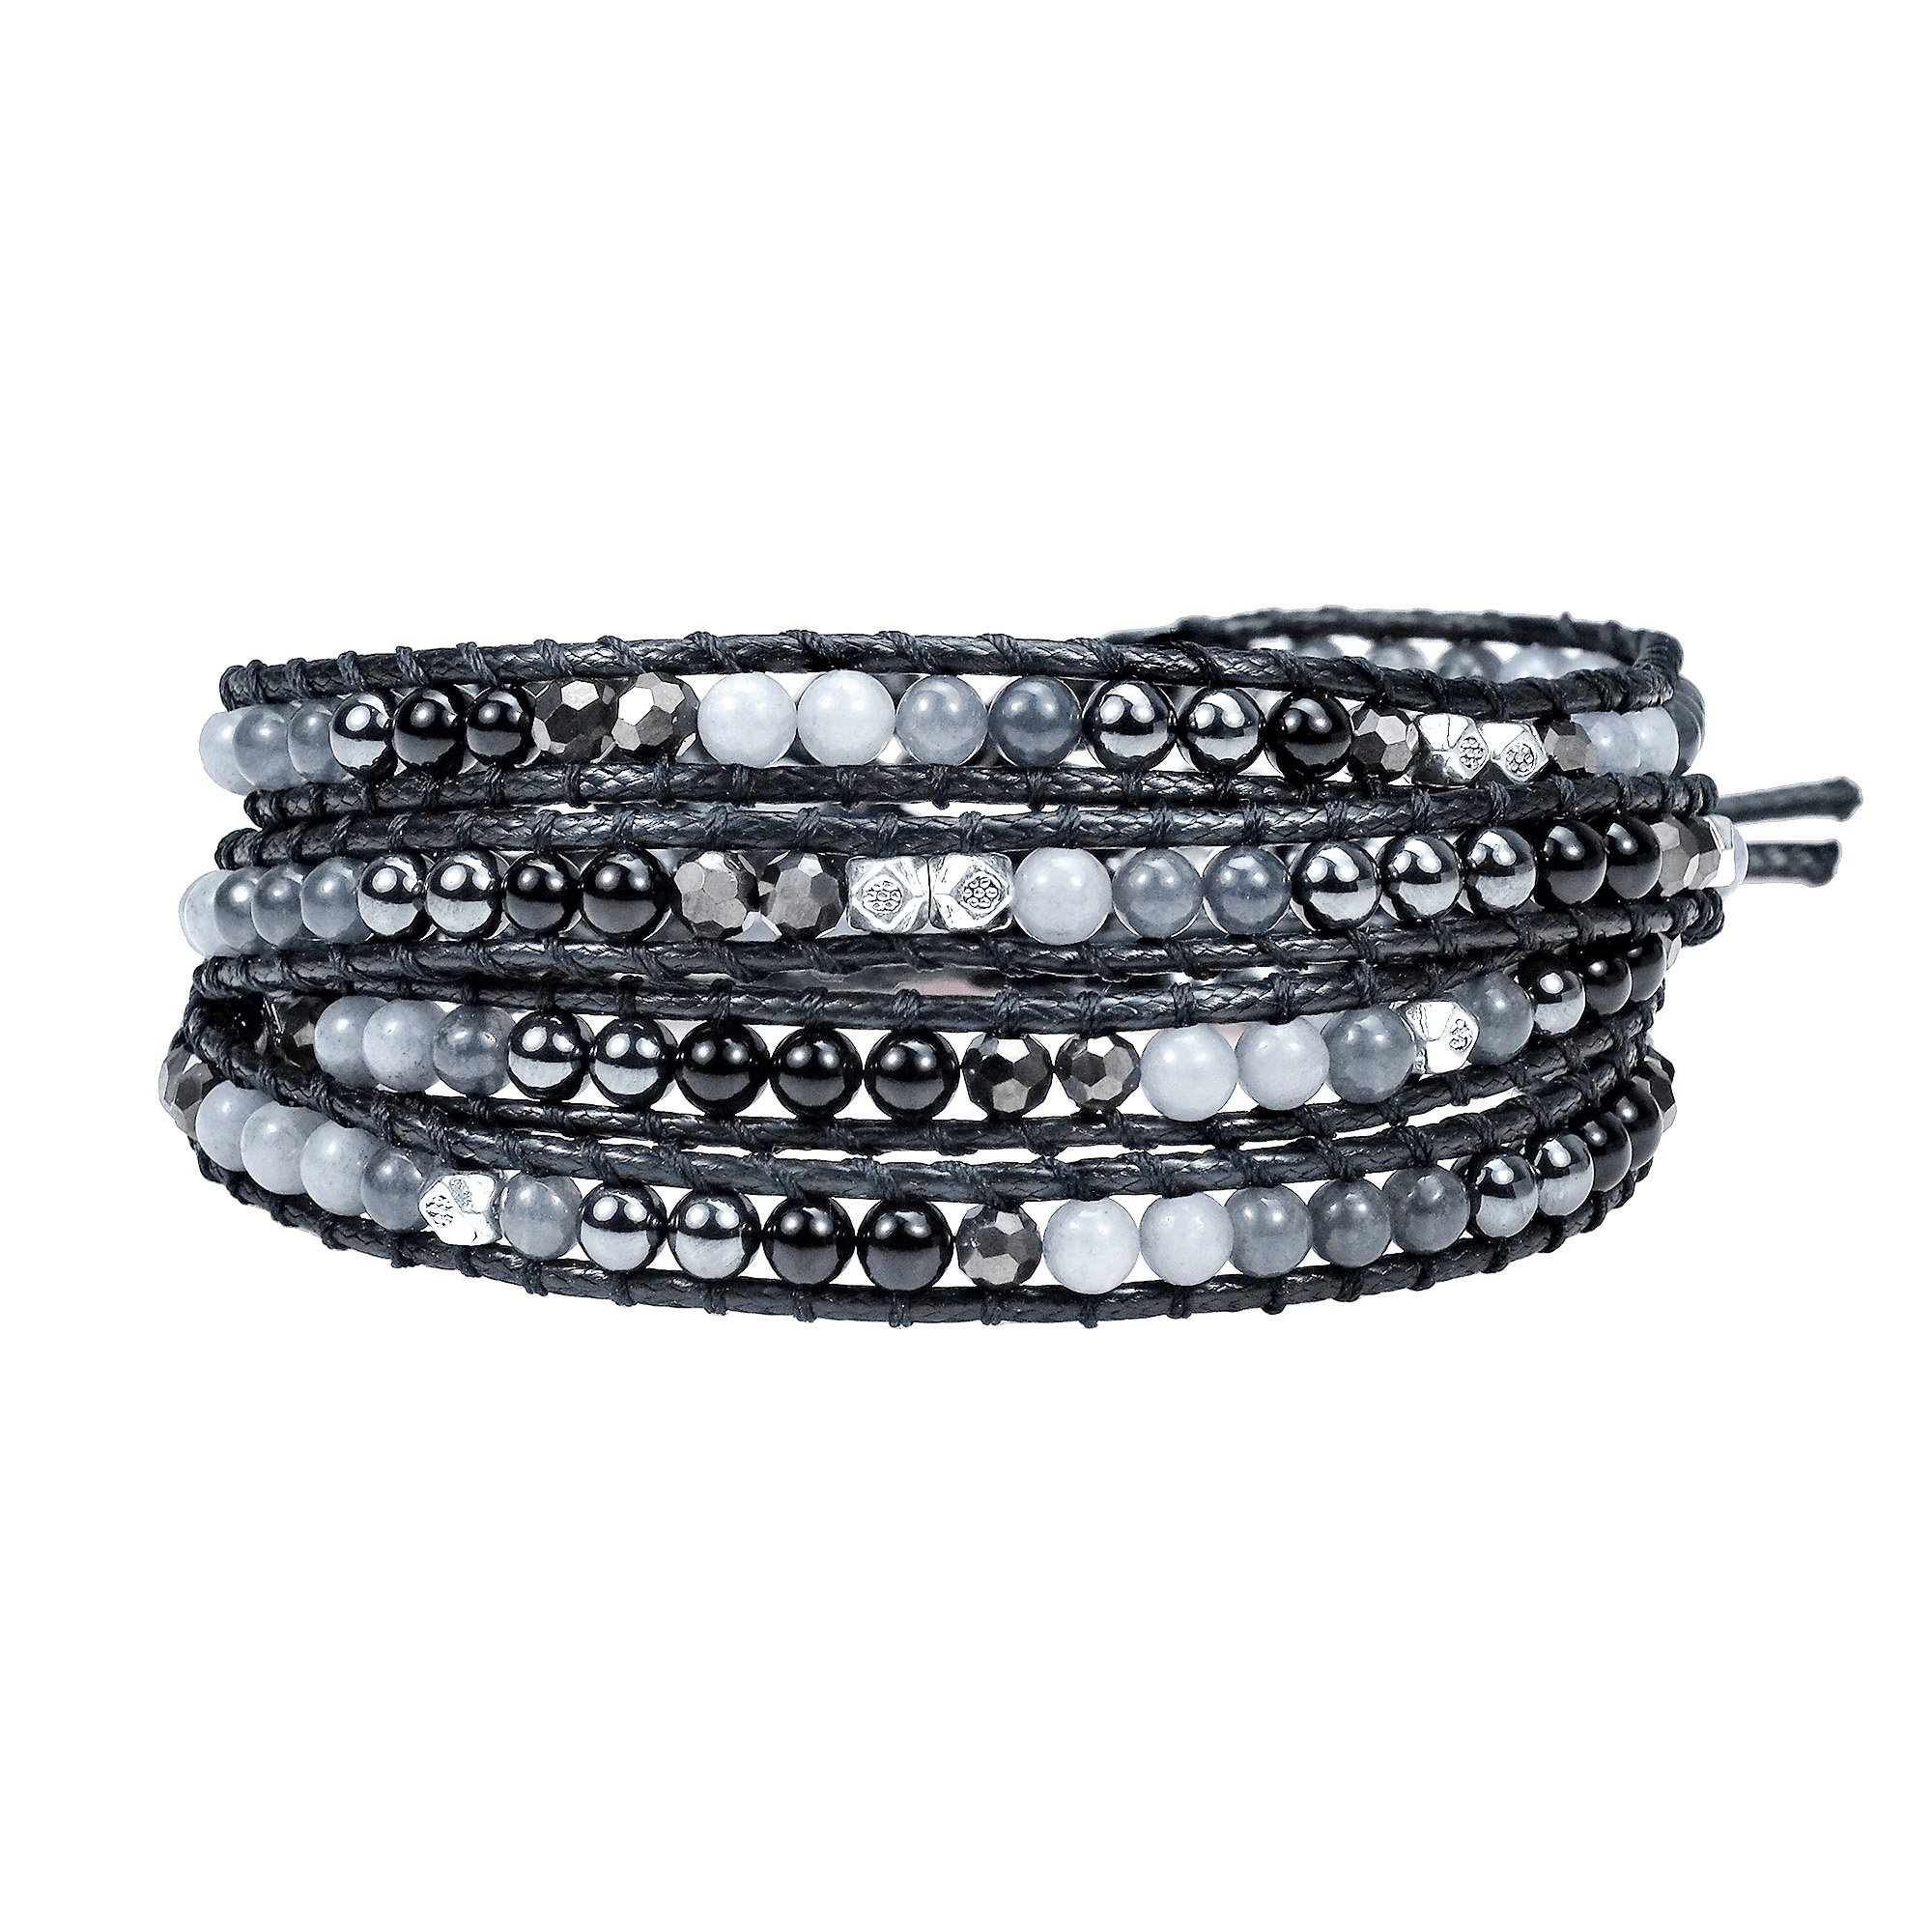 AeraVida Infinite Harmony Shades of Gray and Fashion Crystal Wrap Bracelet